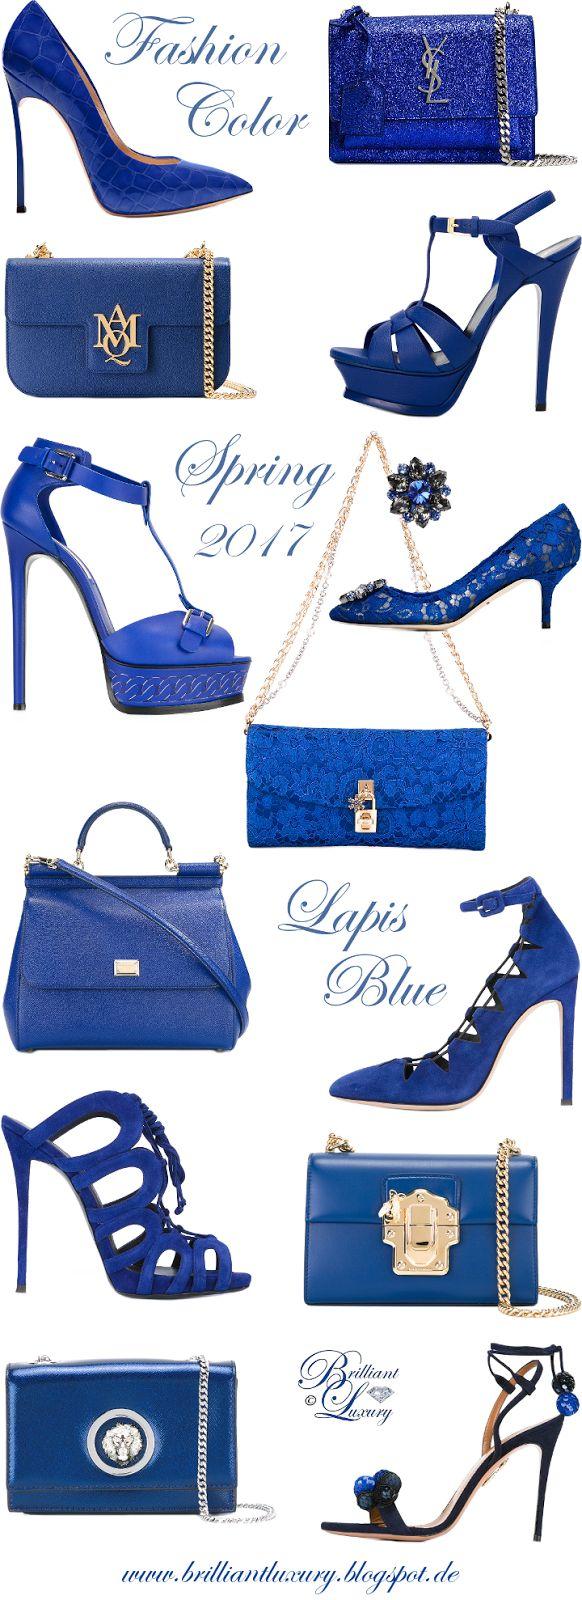 Pantone Lapis Blue. Tendencia de color Pantone temporada Primavera-Verano 2017. #amarantto #lifestyle #tendencia #color #moda #pantone #2017 #LapisBlue